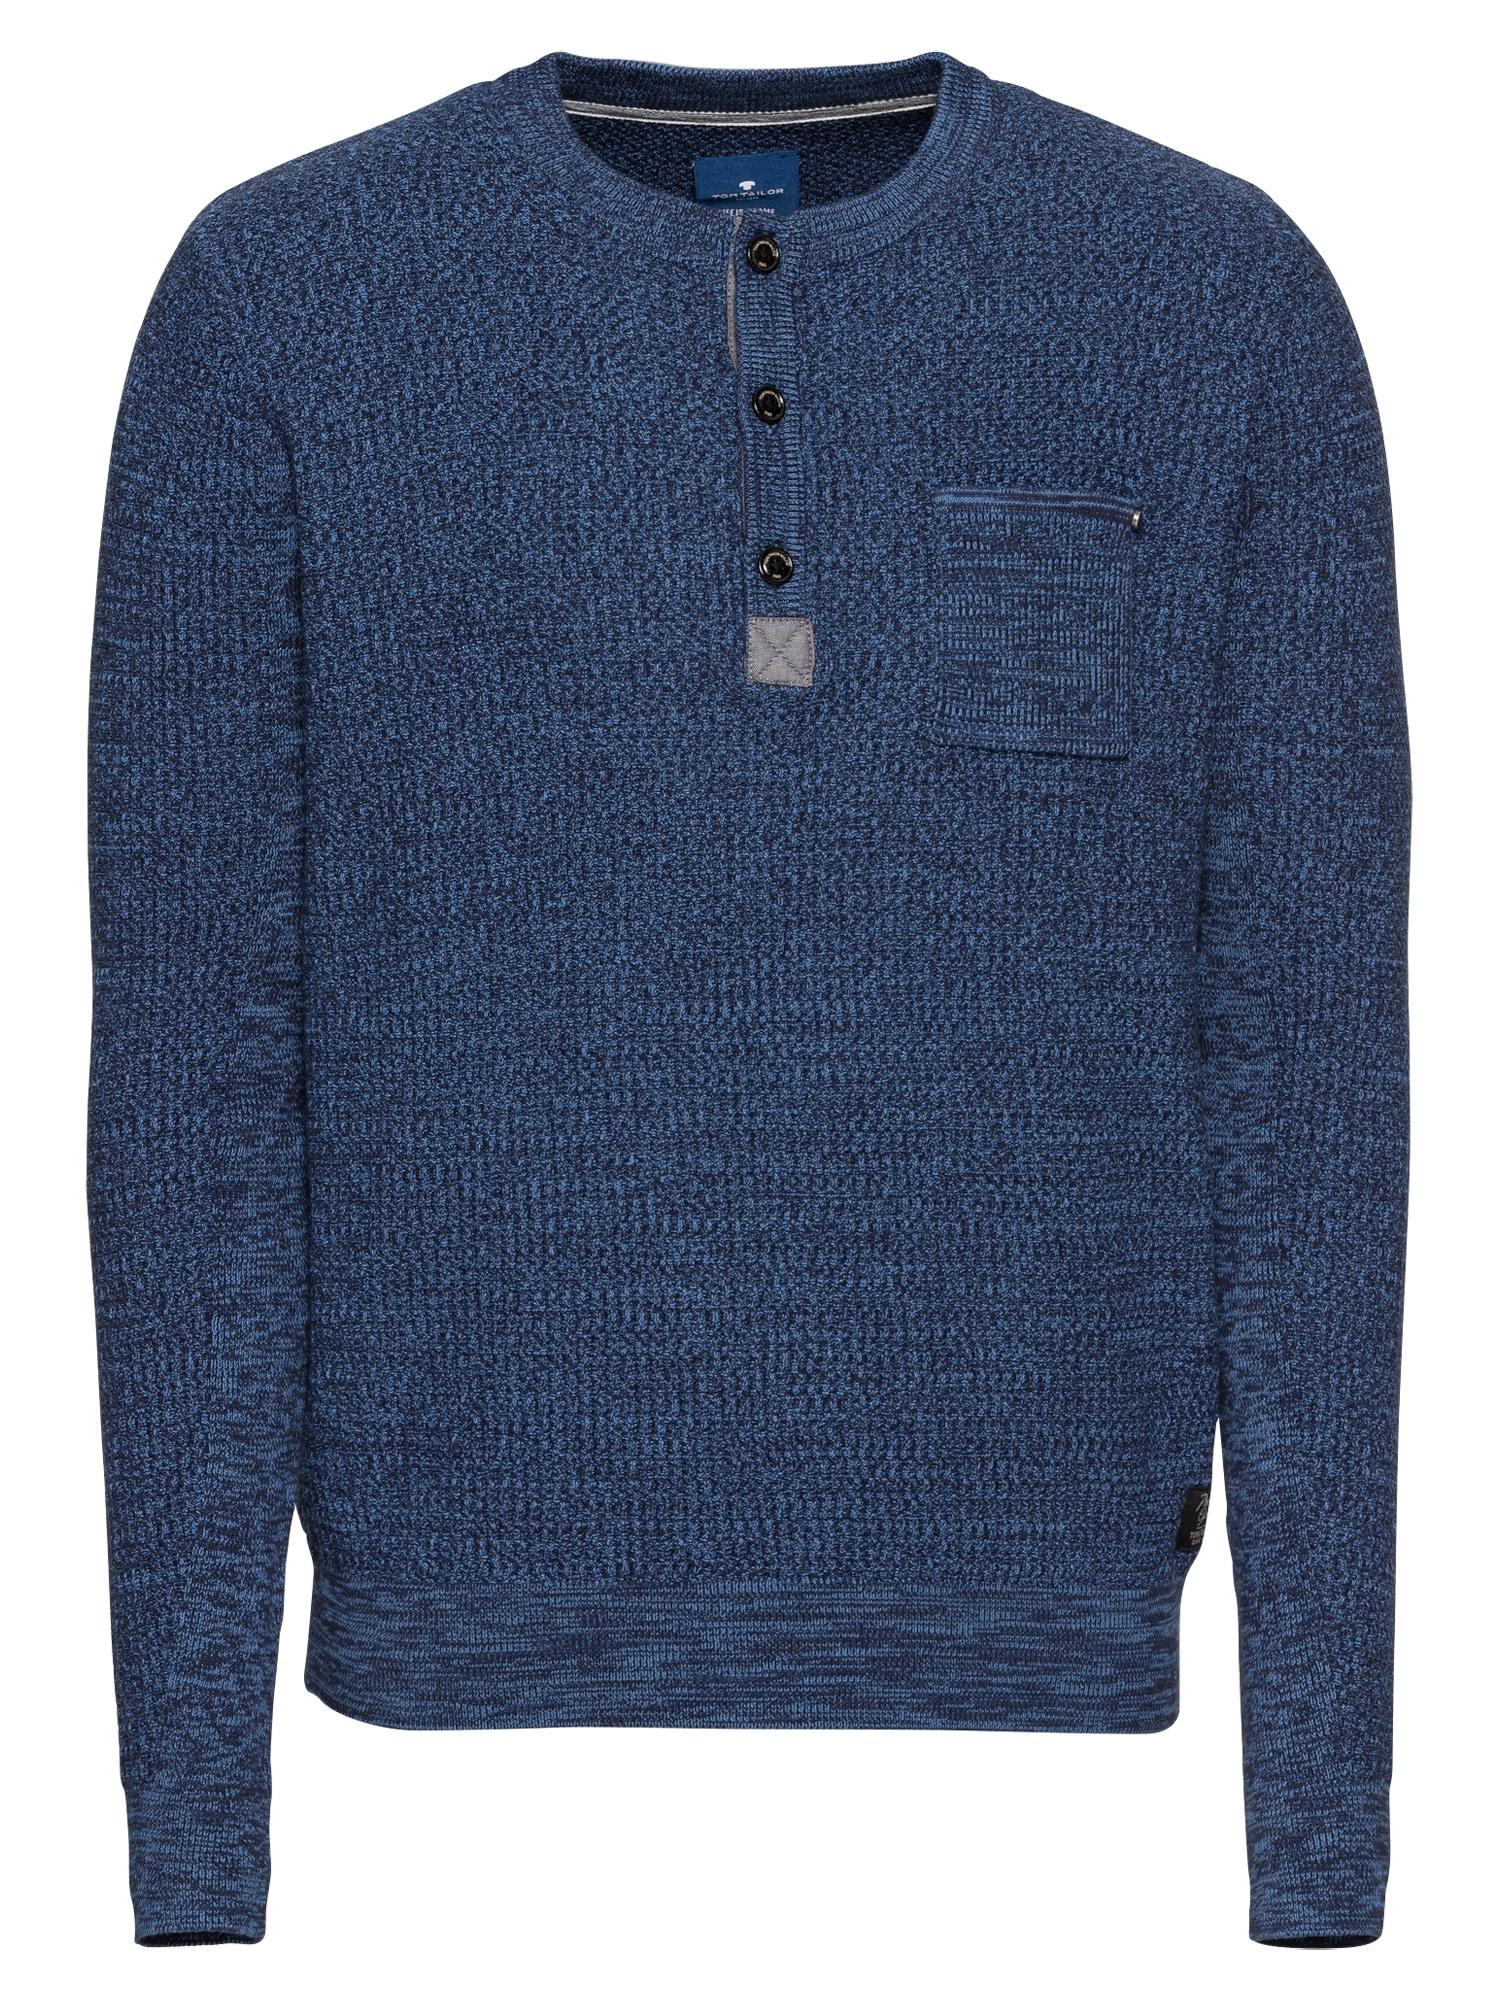 Svetr structured mouline sweater modrá TOM TAILOR